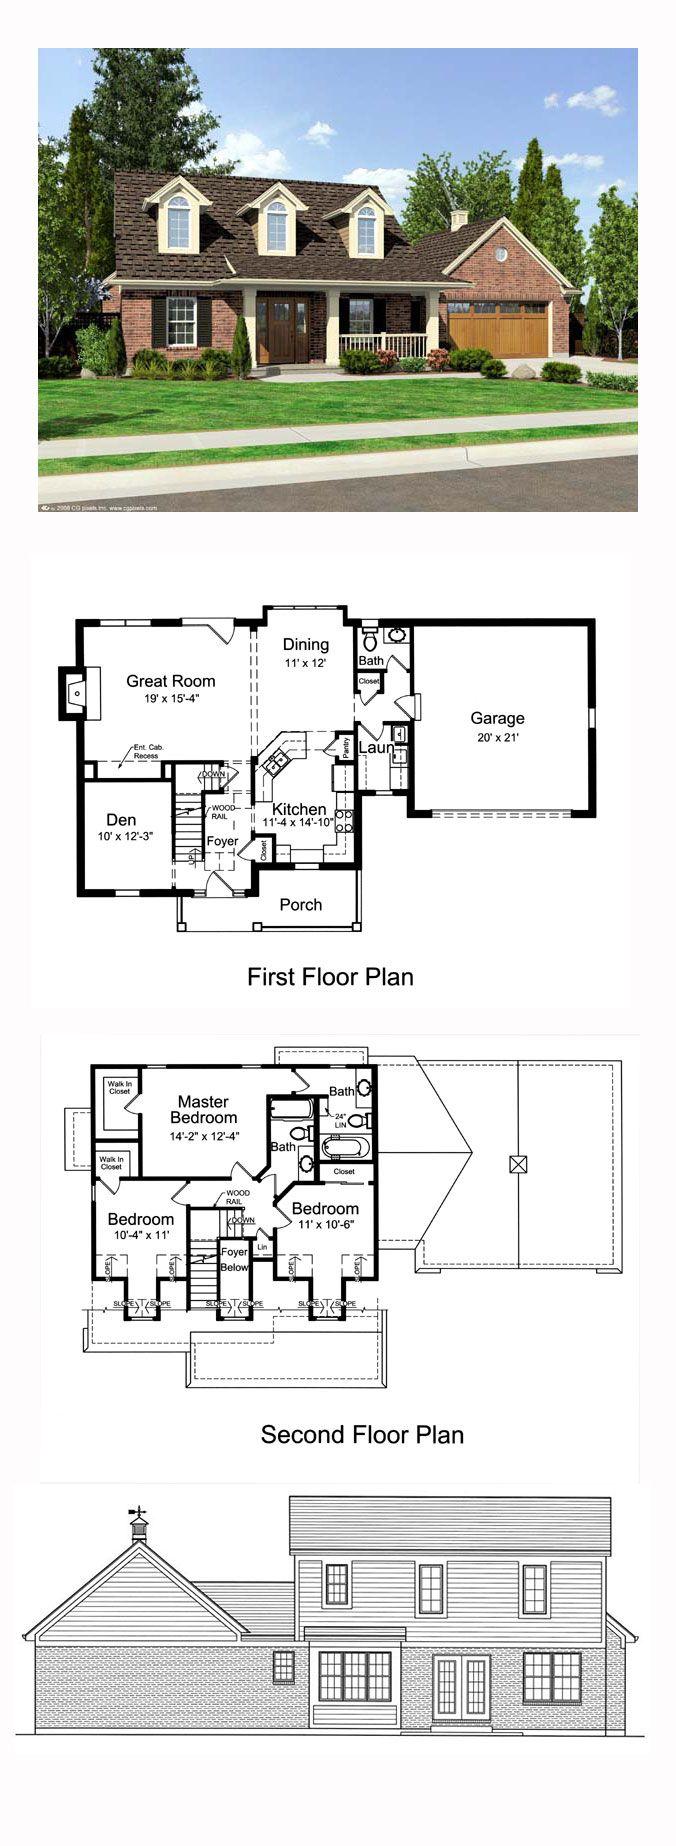 Cape Cod Style House Plan 50169 With 3 Bed 3 Bath 2 Car Garage Cape Cod House Plans Cape Cod Style House Cape Cod House